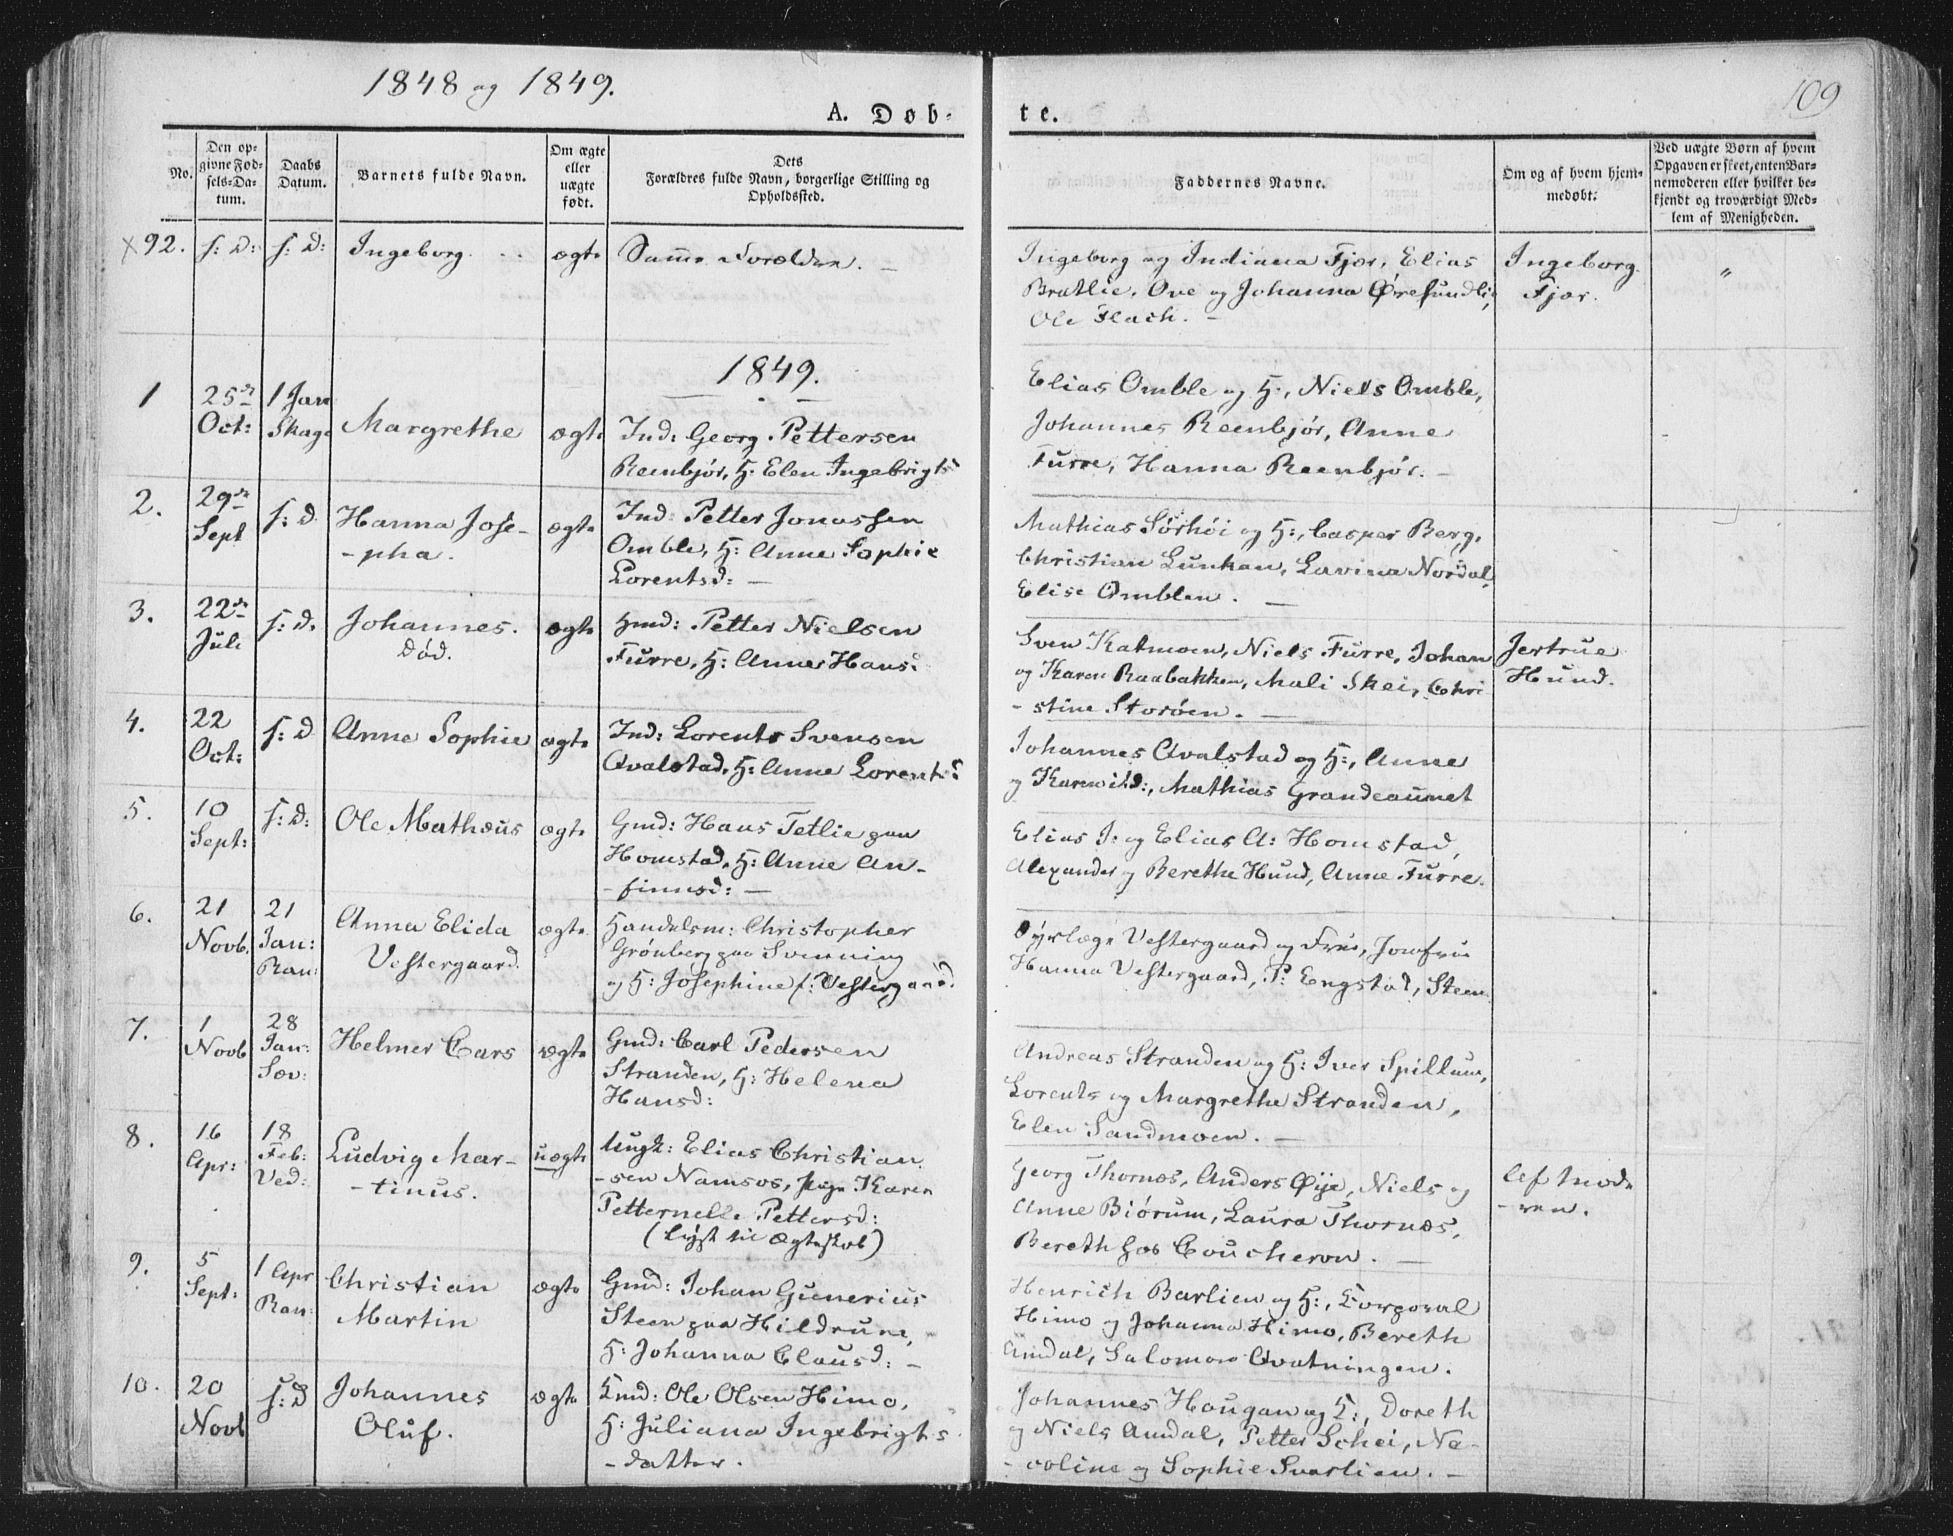 SAT, Ministerialprotokoller, klokkerbøker og fødselsregistre - Nord-Trøndelag, 764/L0551: Ministerialbok nr. 764A07a, 1824-1864, s. 109